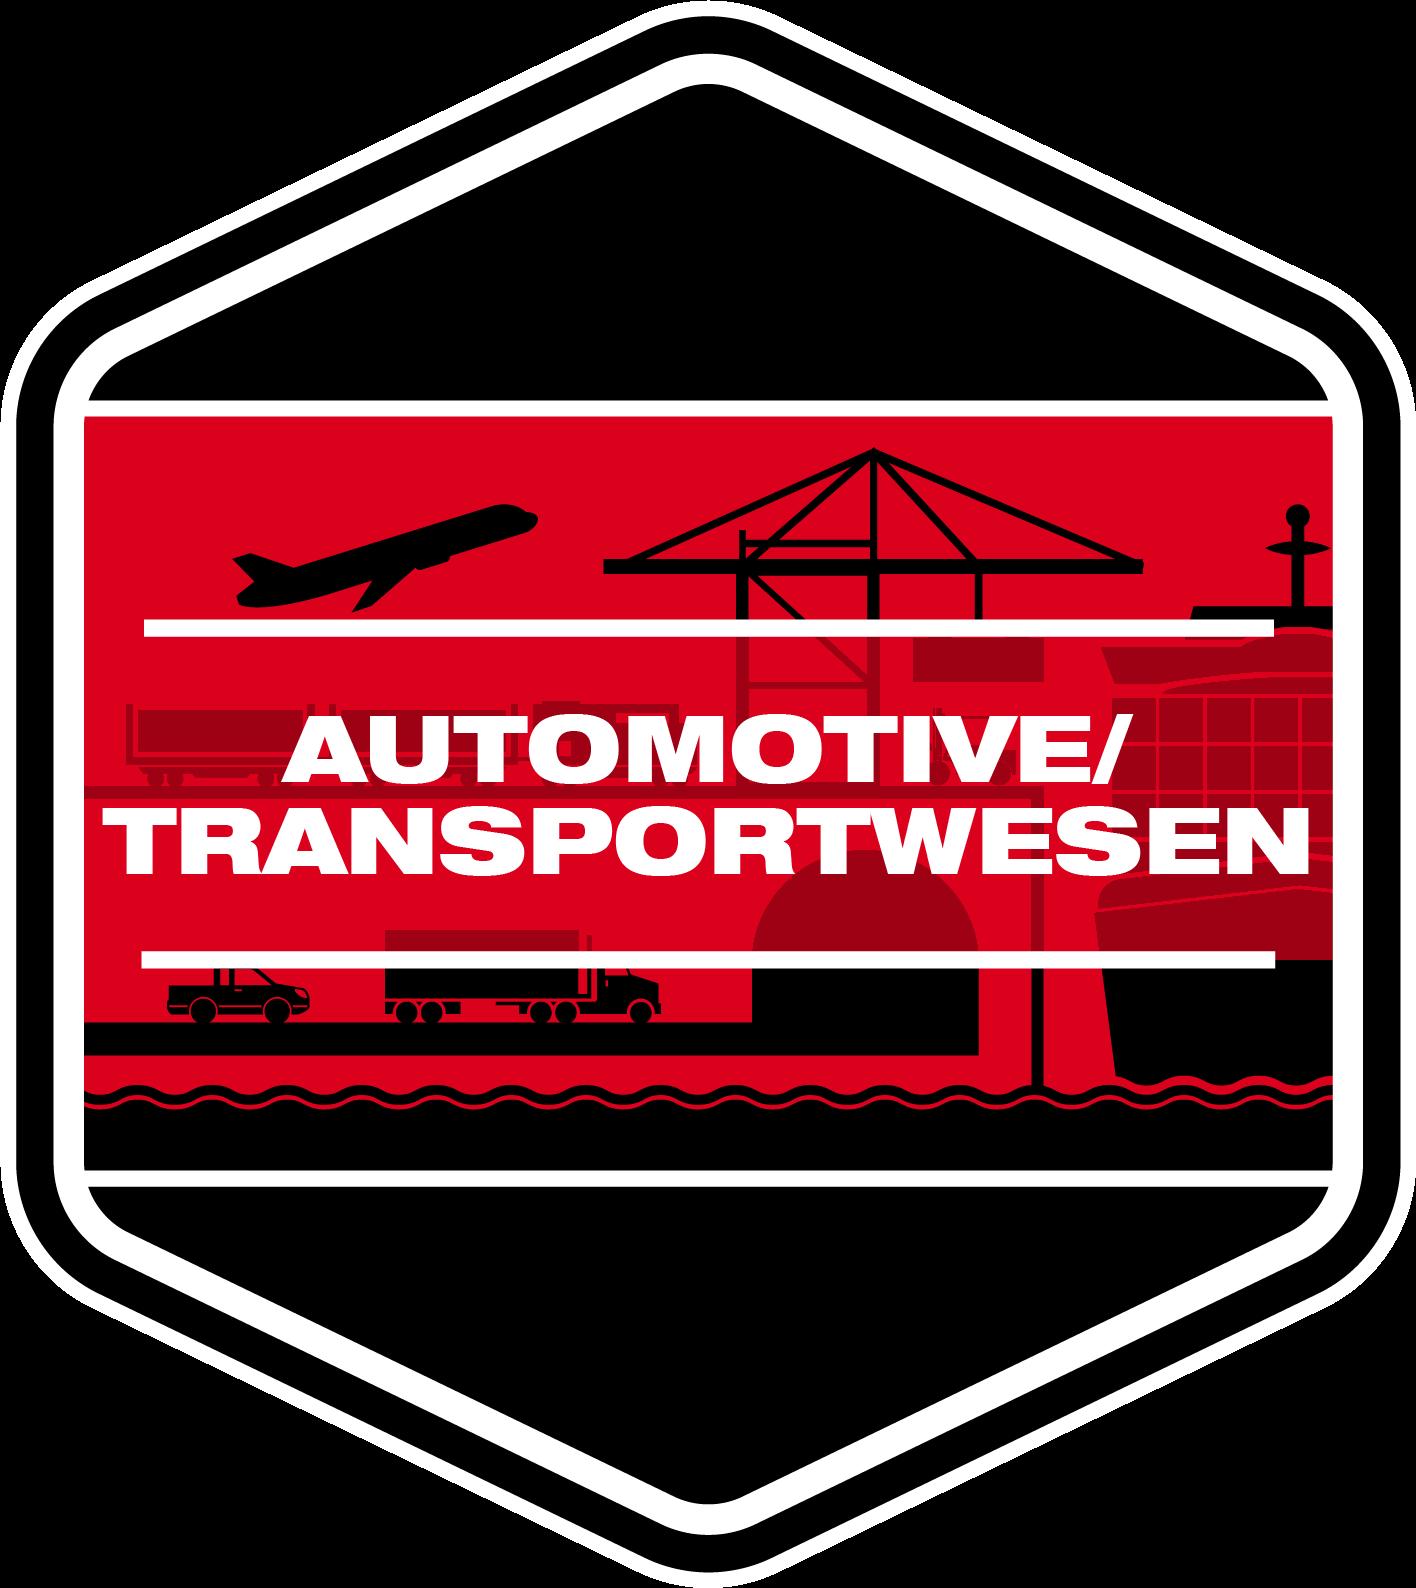 Transportwesen